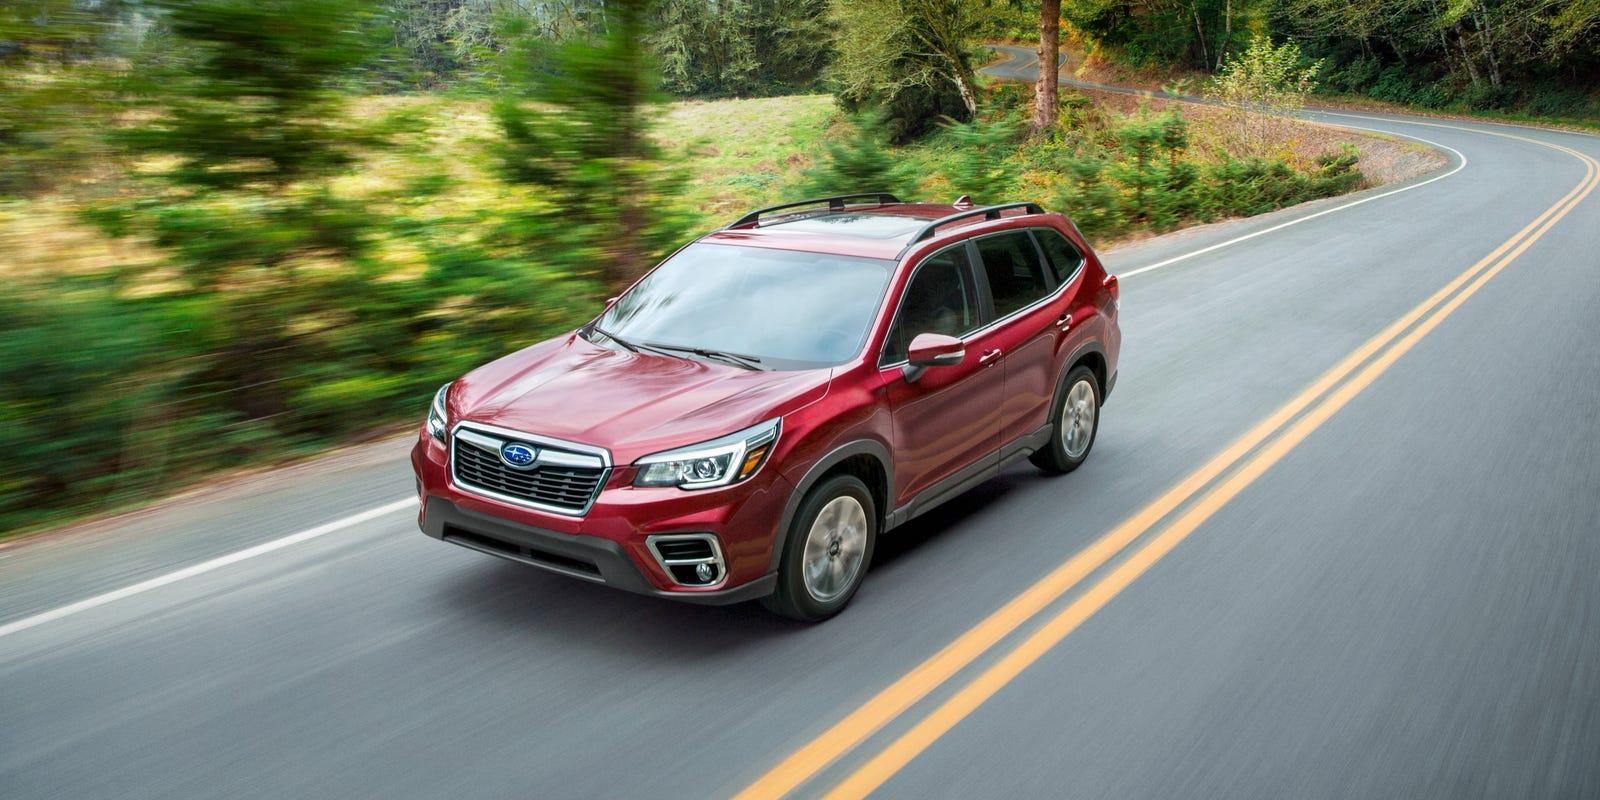 2020 Subaru Forester Turbo, STI, Hybrid >> Subaru Forester Crosstrek Production Halted For Potential